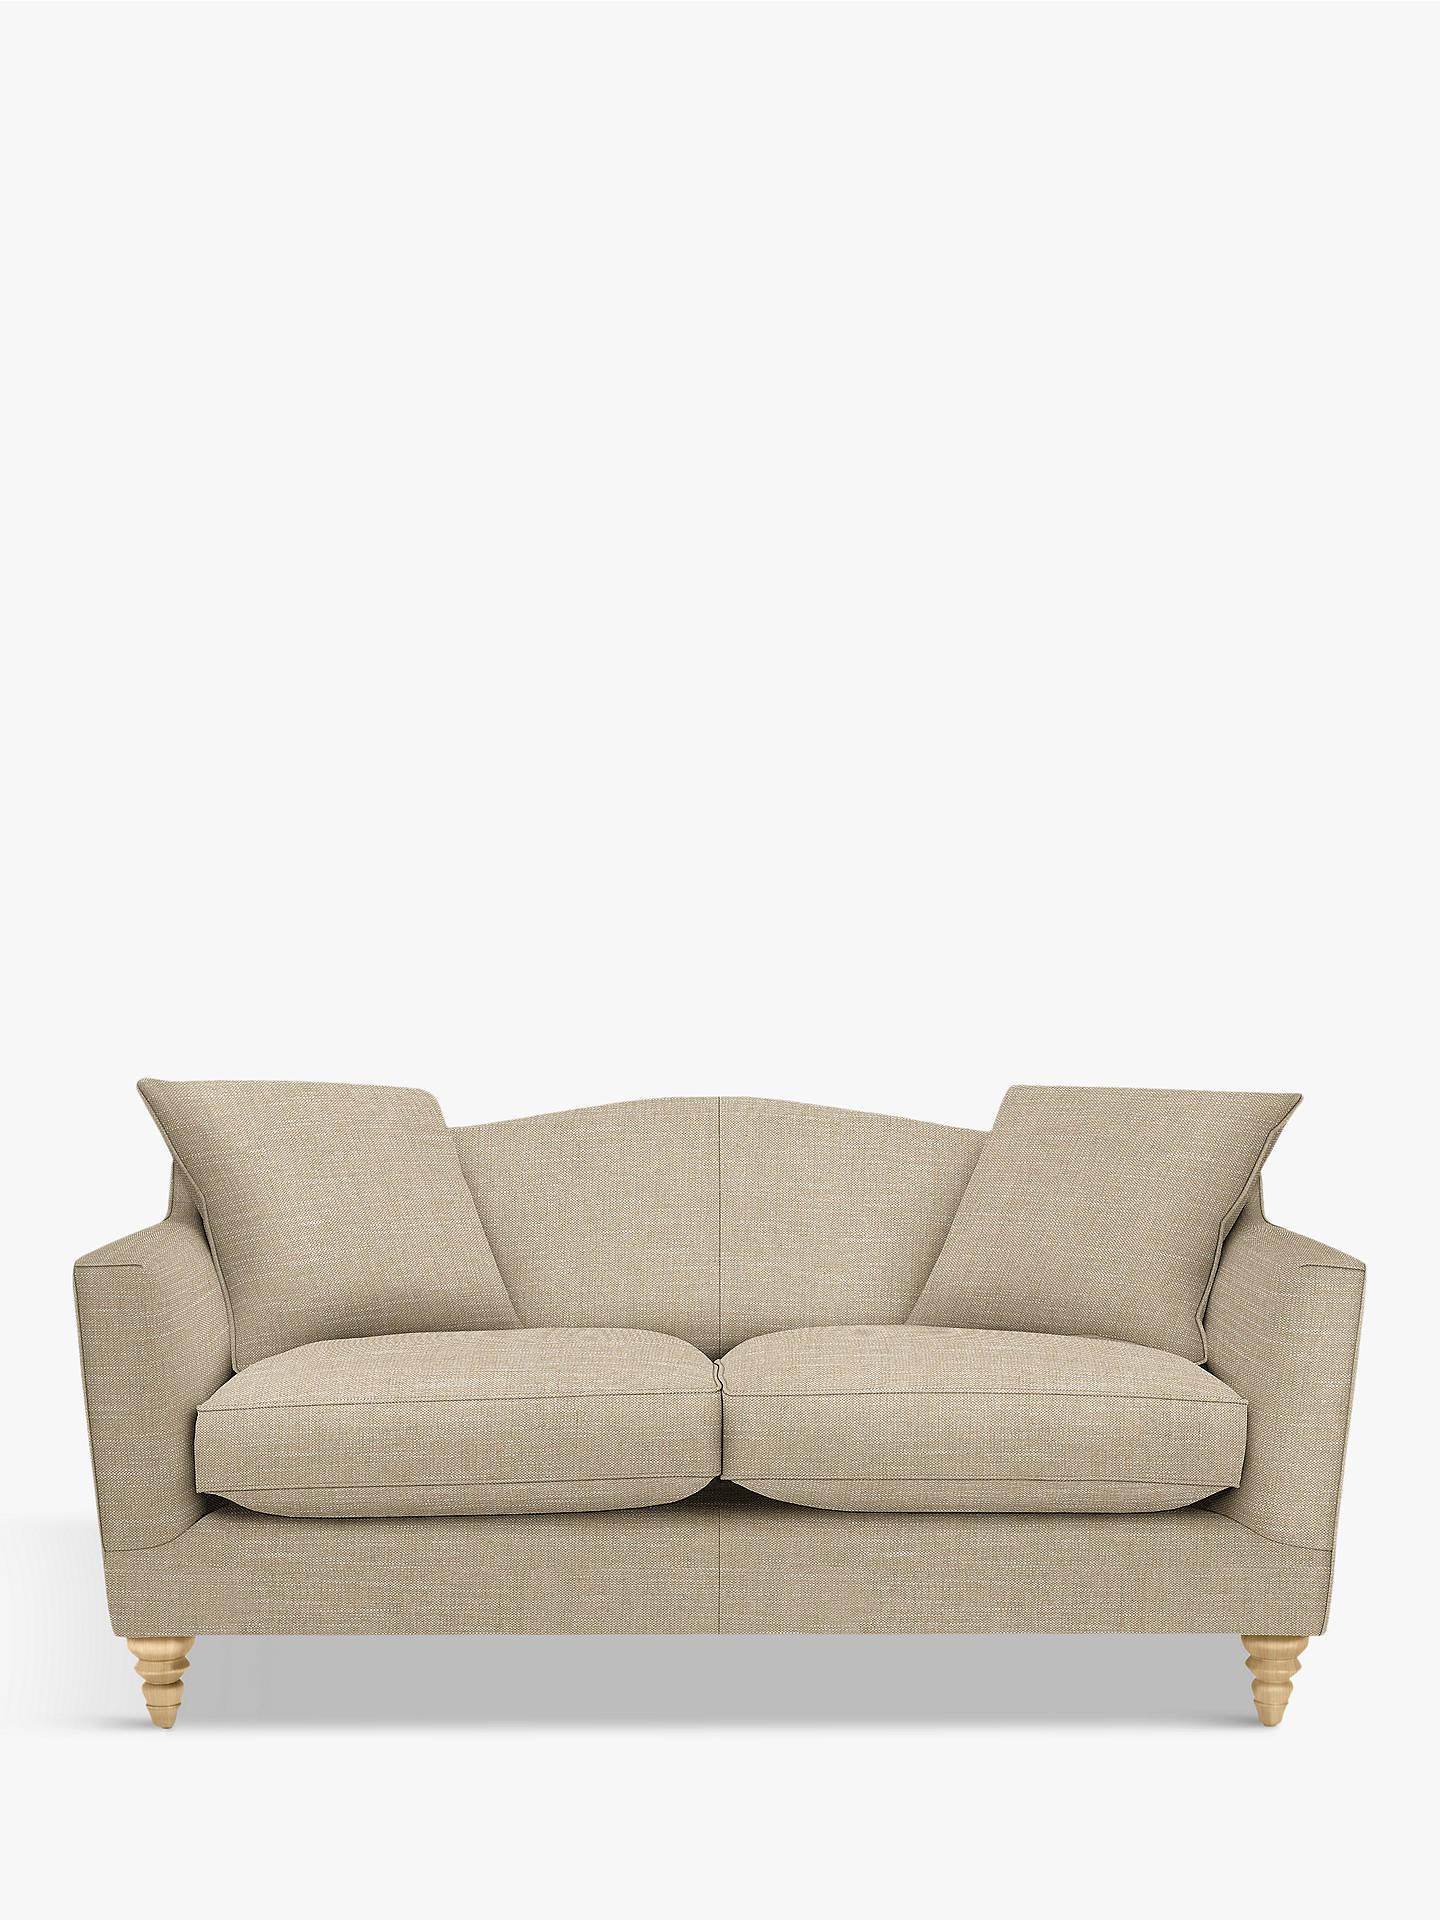 Terrific Croft Collection Melrose Medium 2 Seater Sofa Light Leg Hope Caramel Pabps2019 Chair Design Images Pabps2019Com